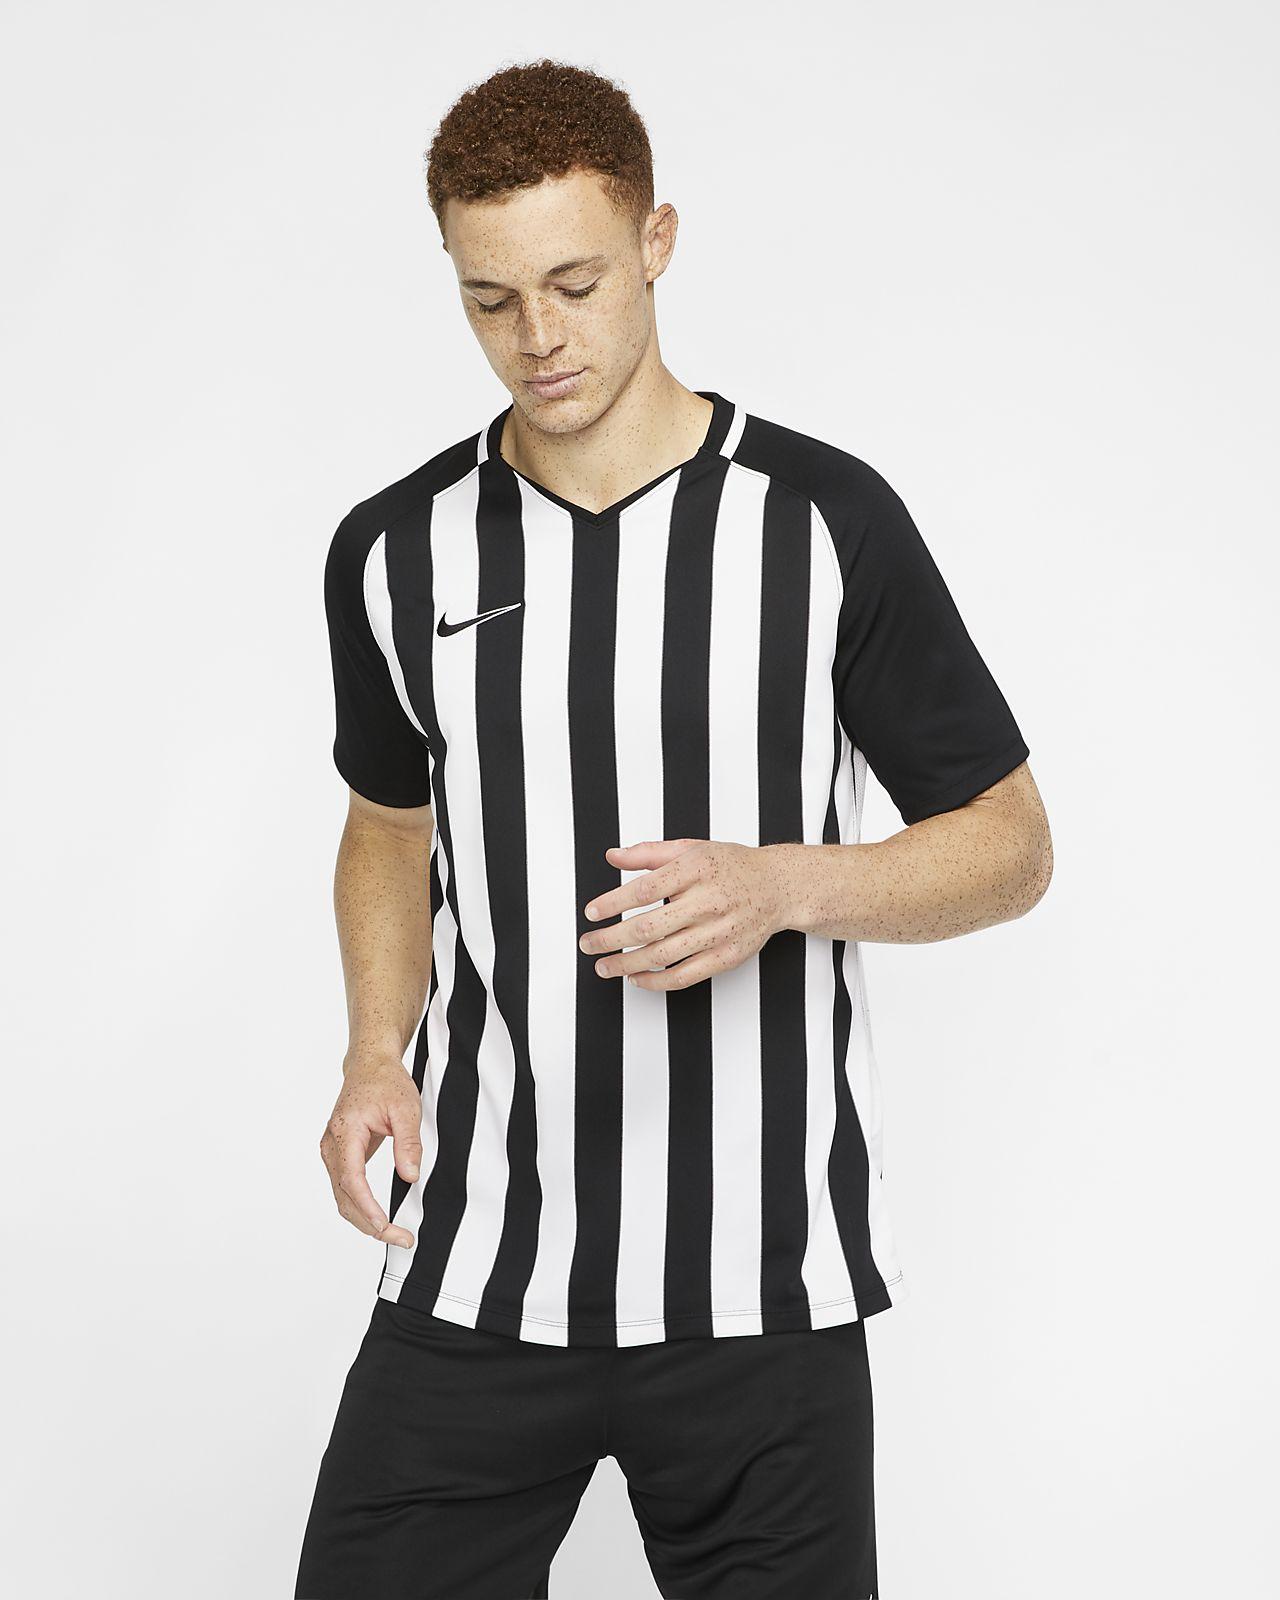 Nike Striped Division 3 Voetbalshirt voor heren